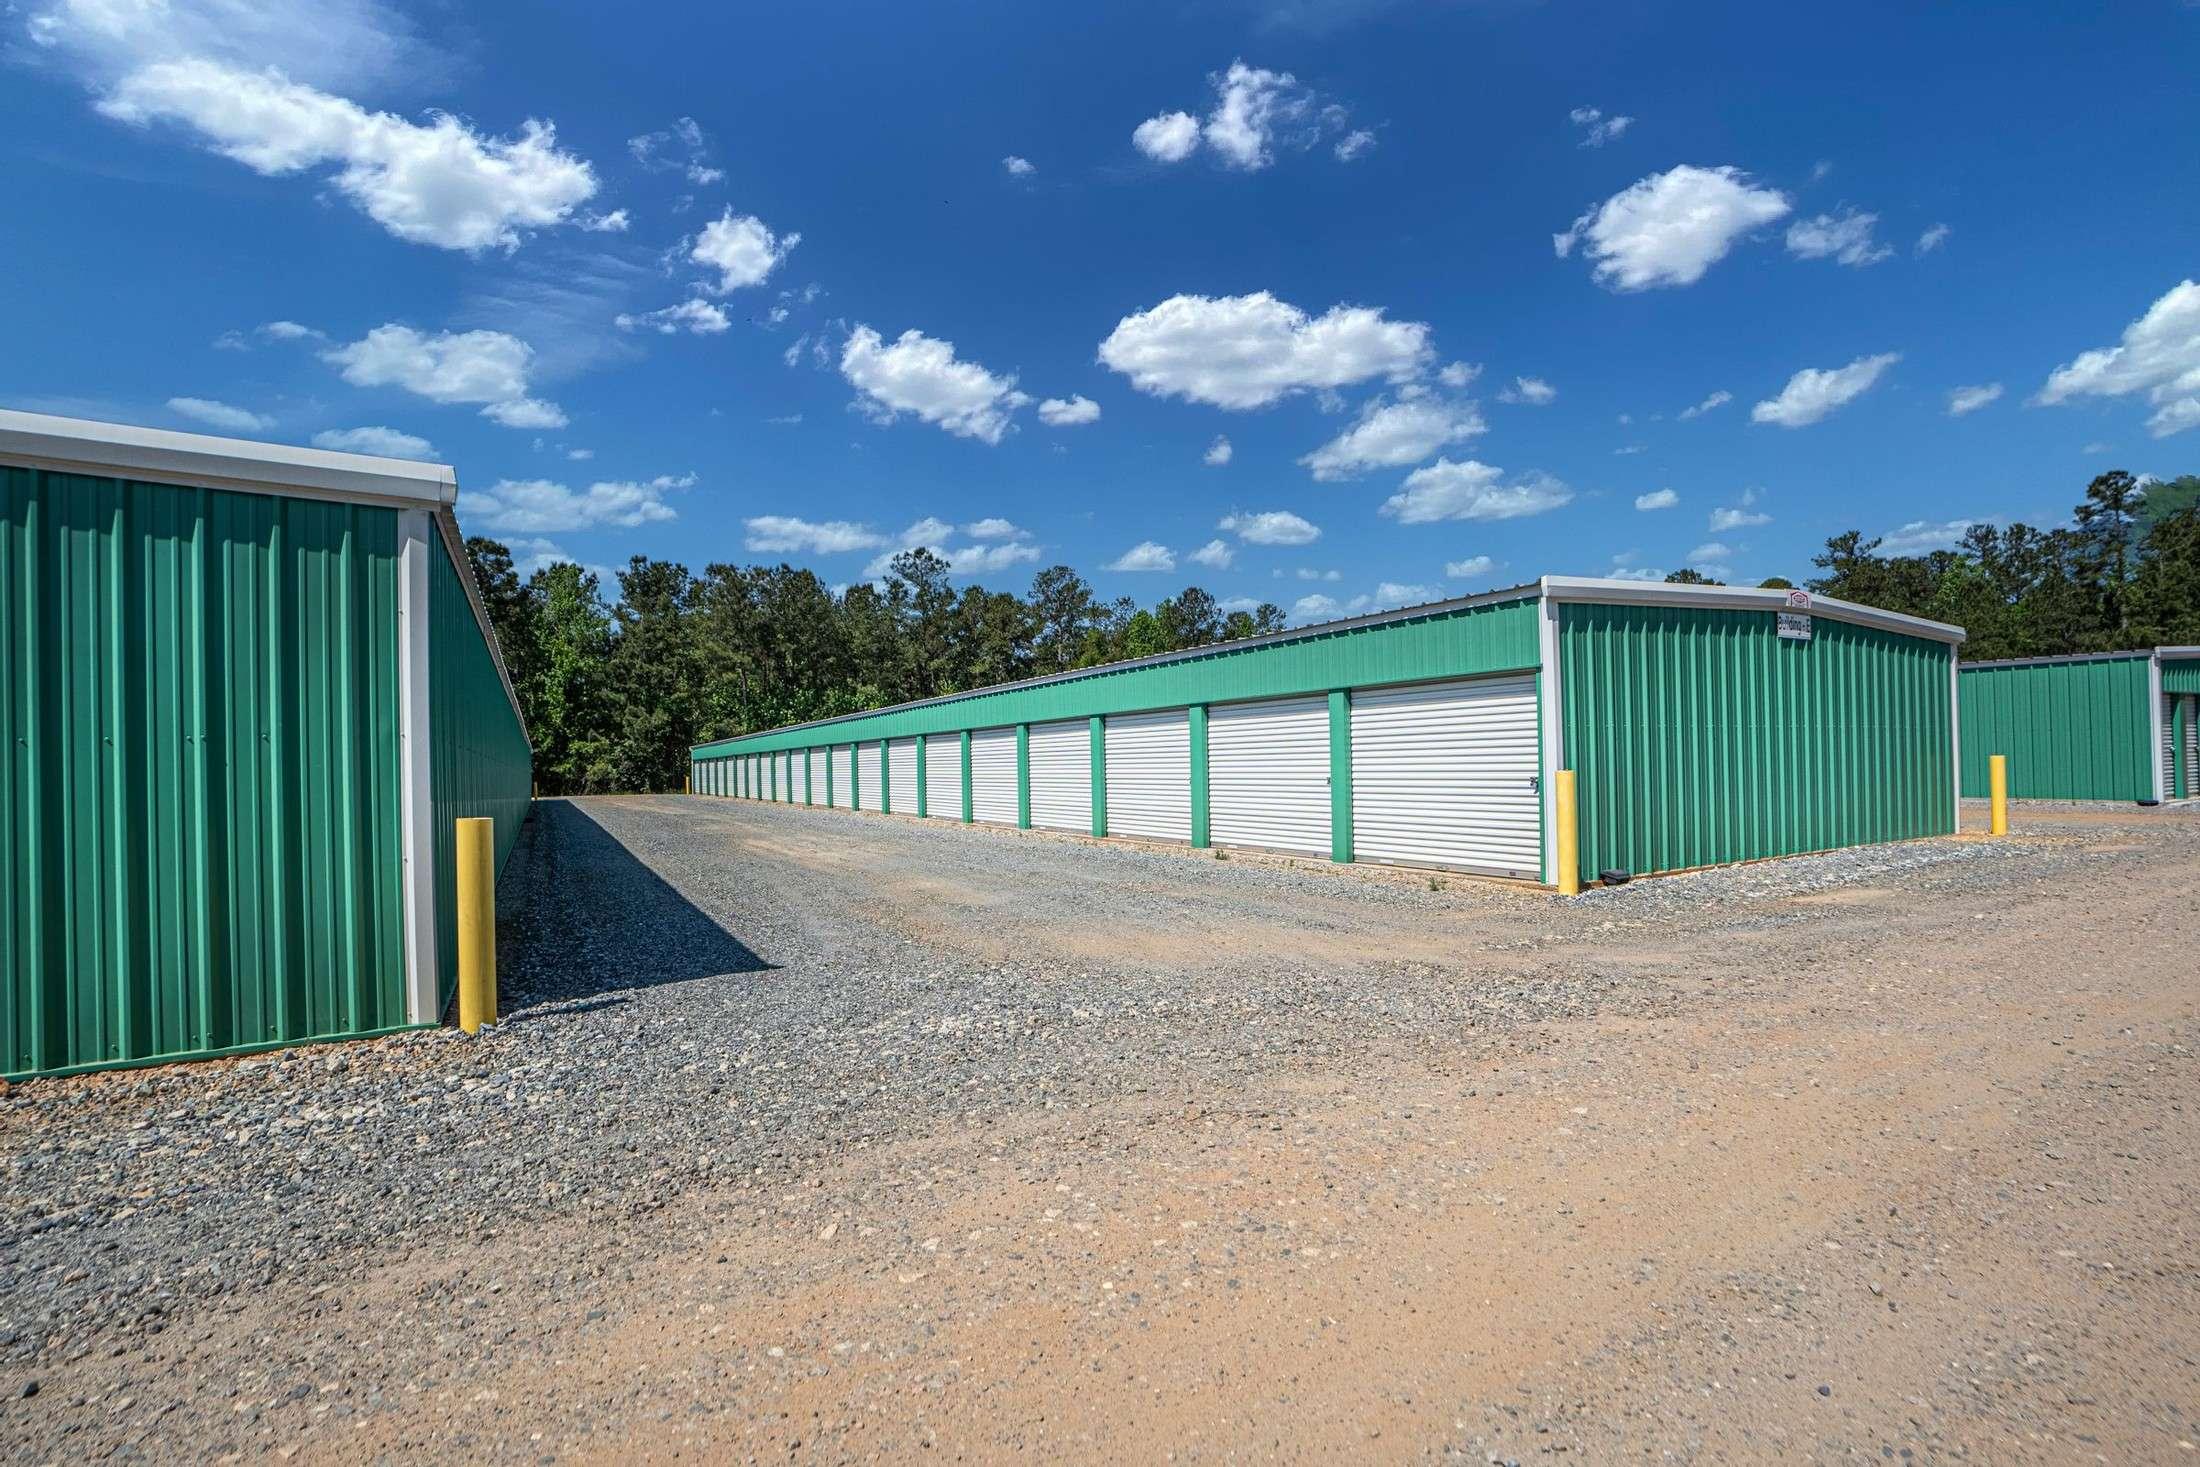 Green Drive Up Storage Units